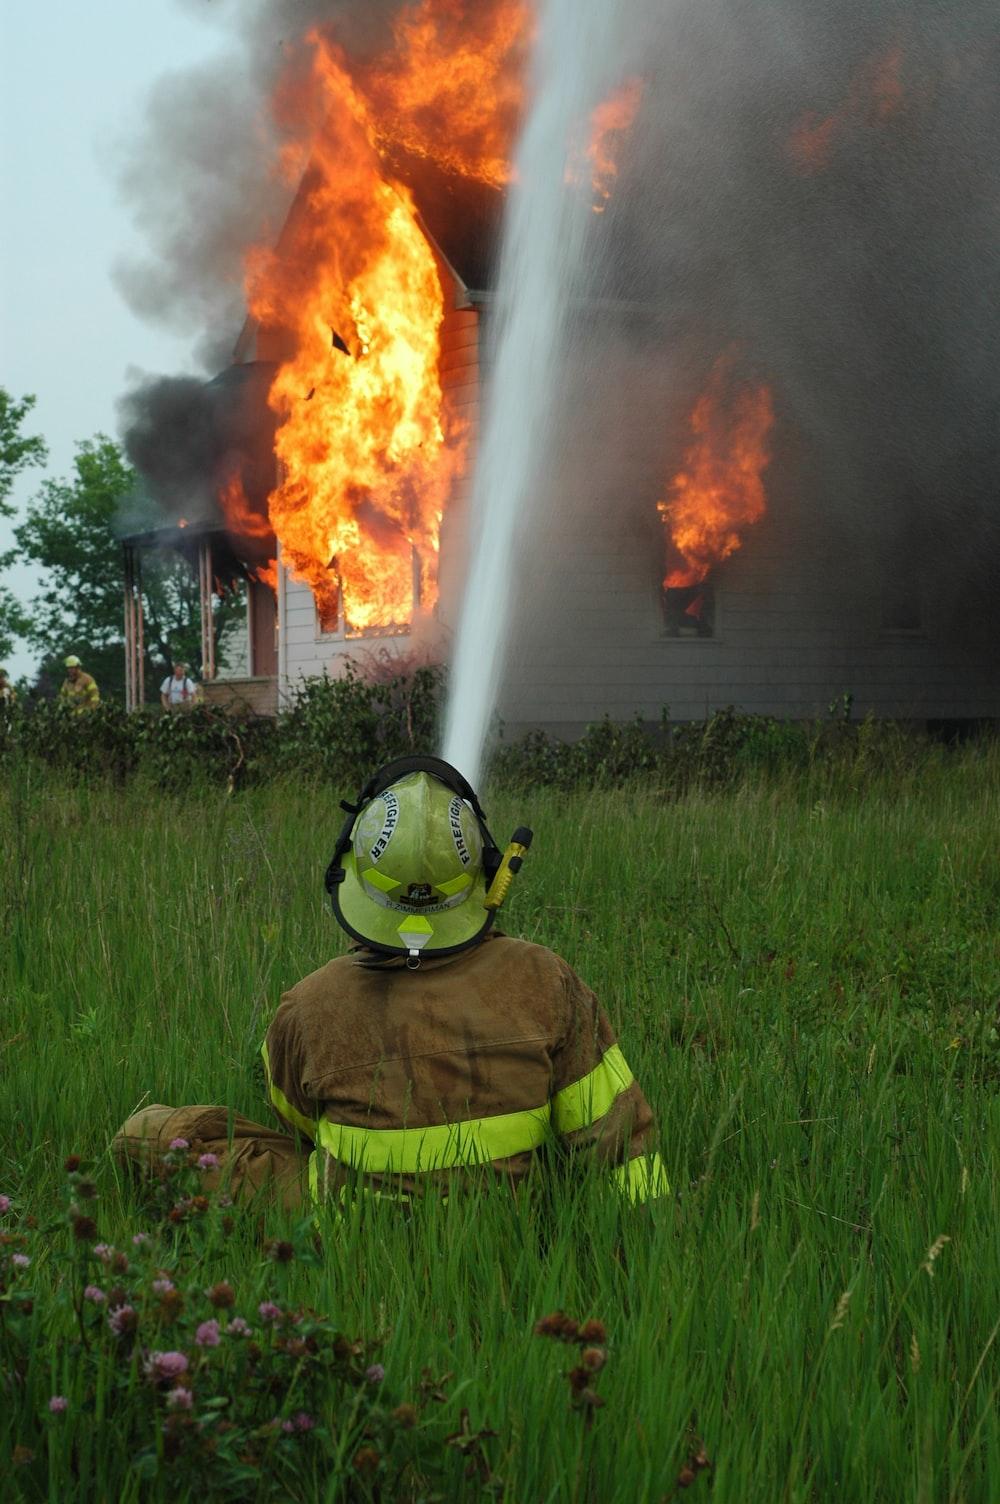 man near flaming house